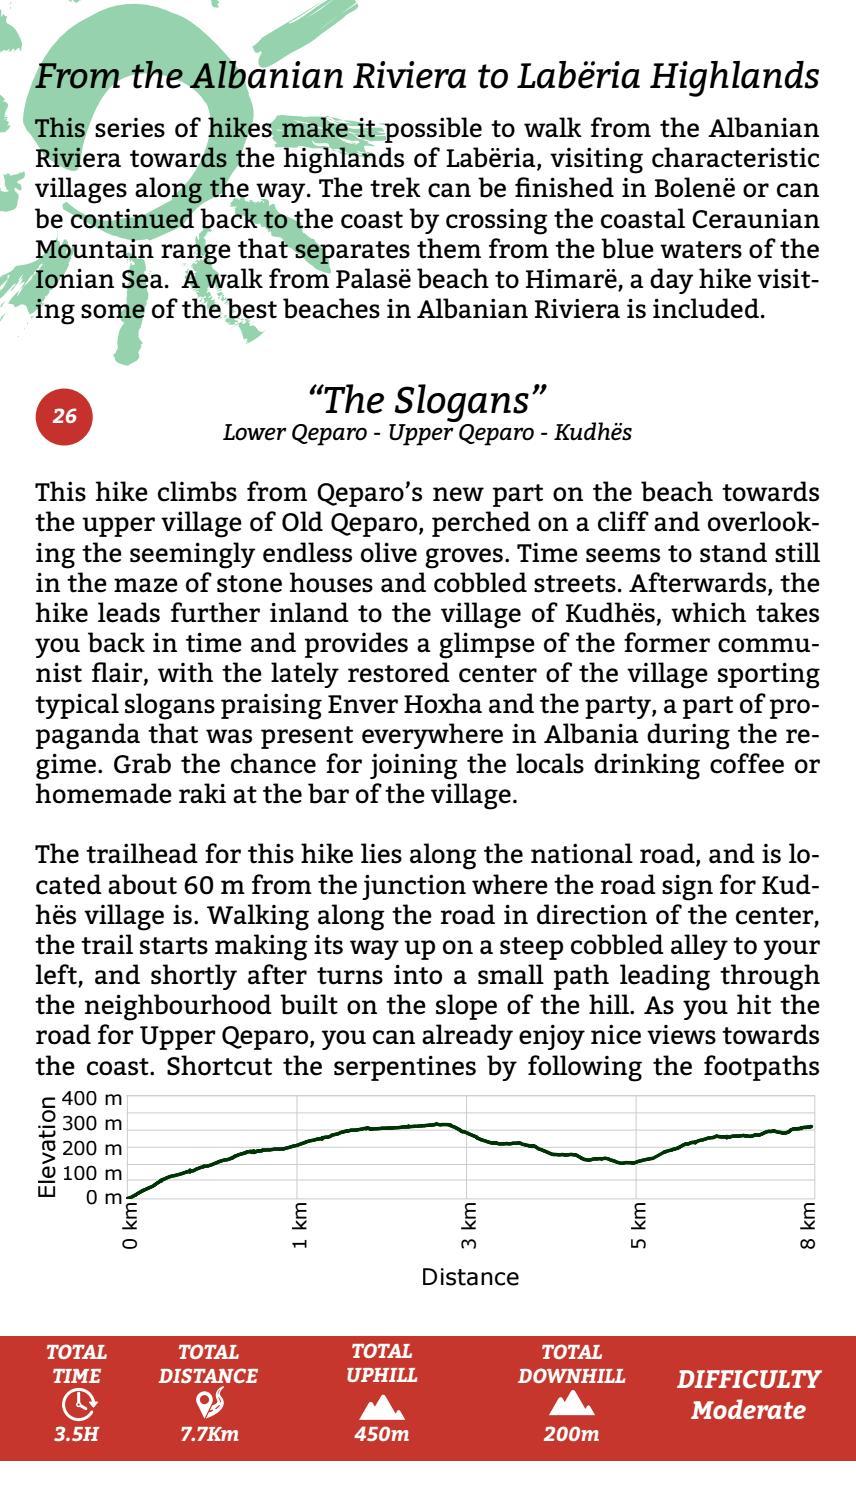 Hiking Trails in Himara Region page 26